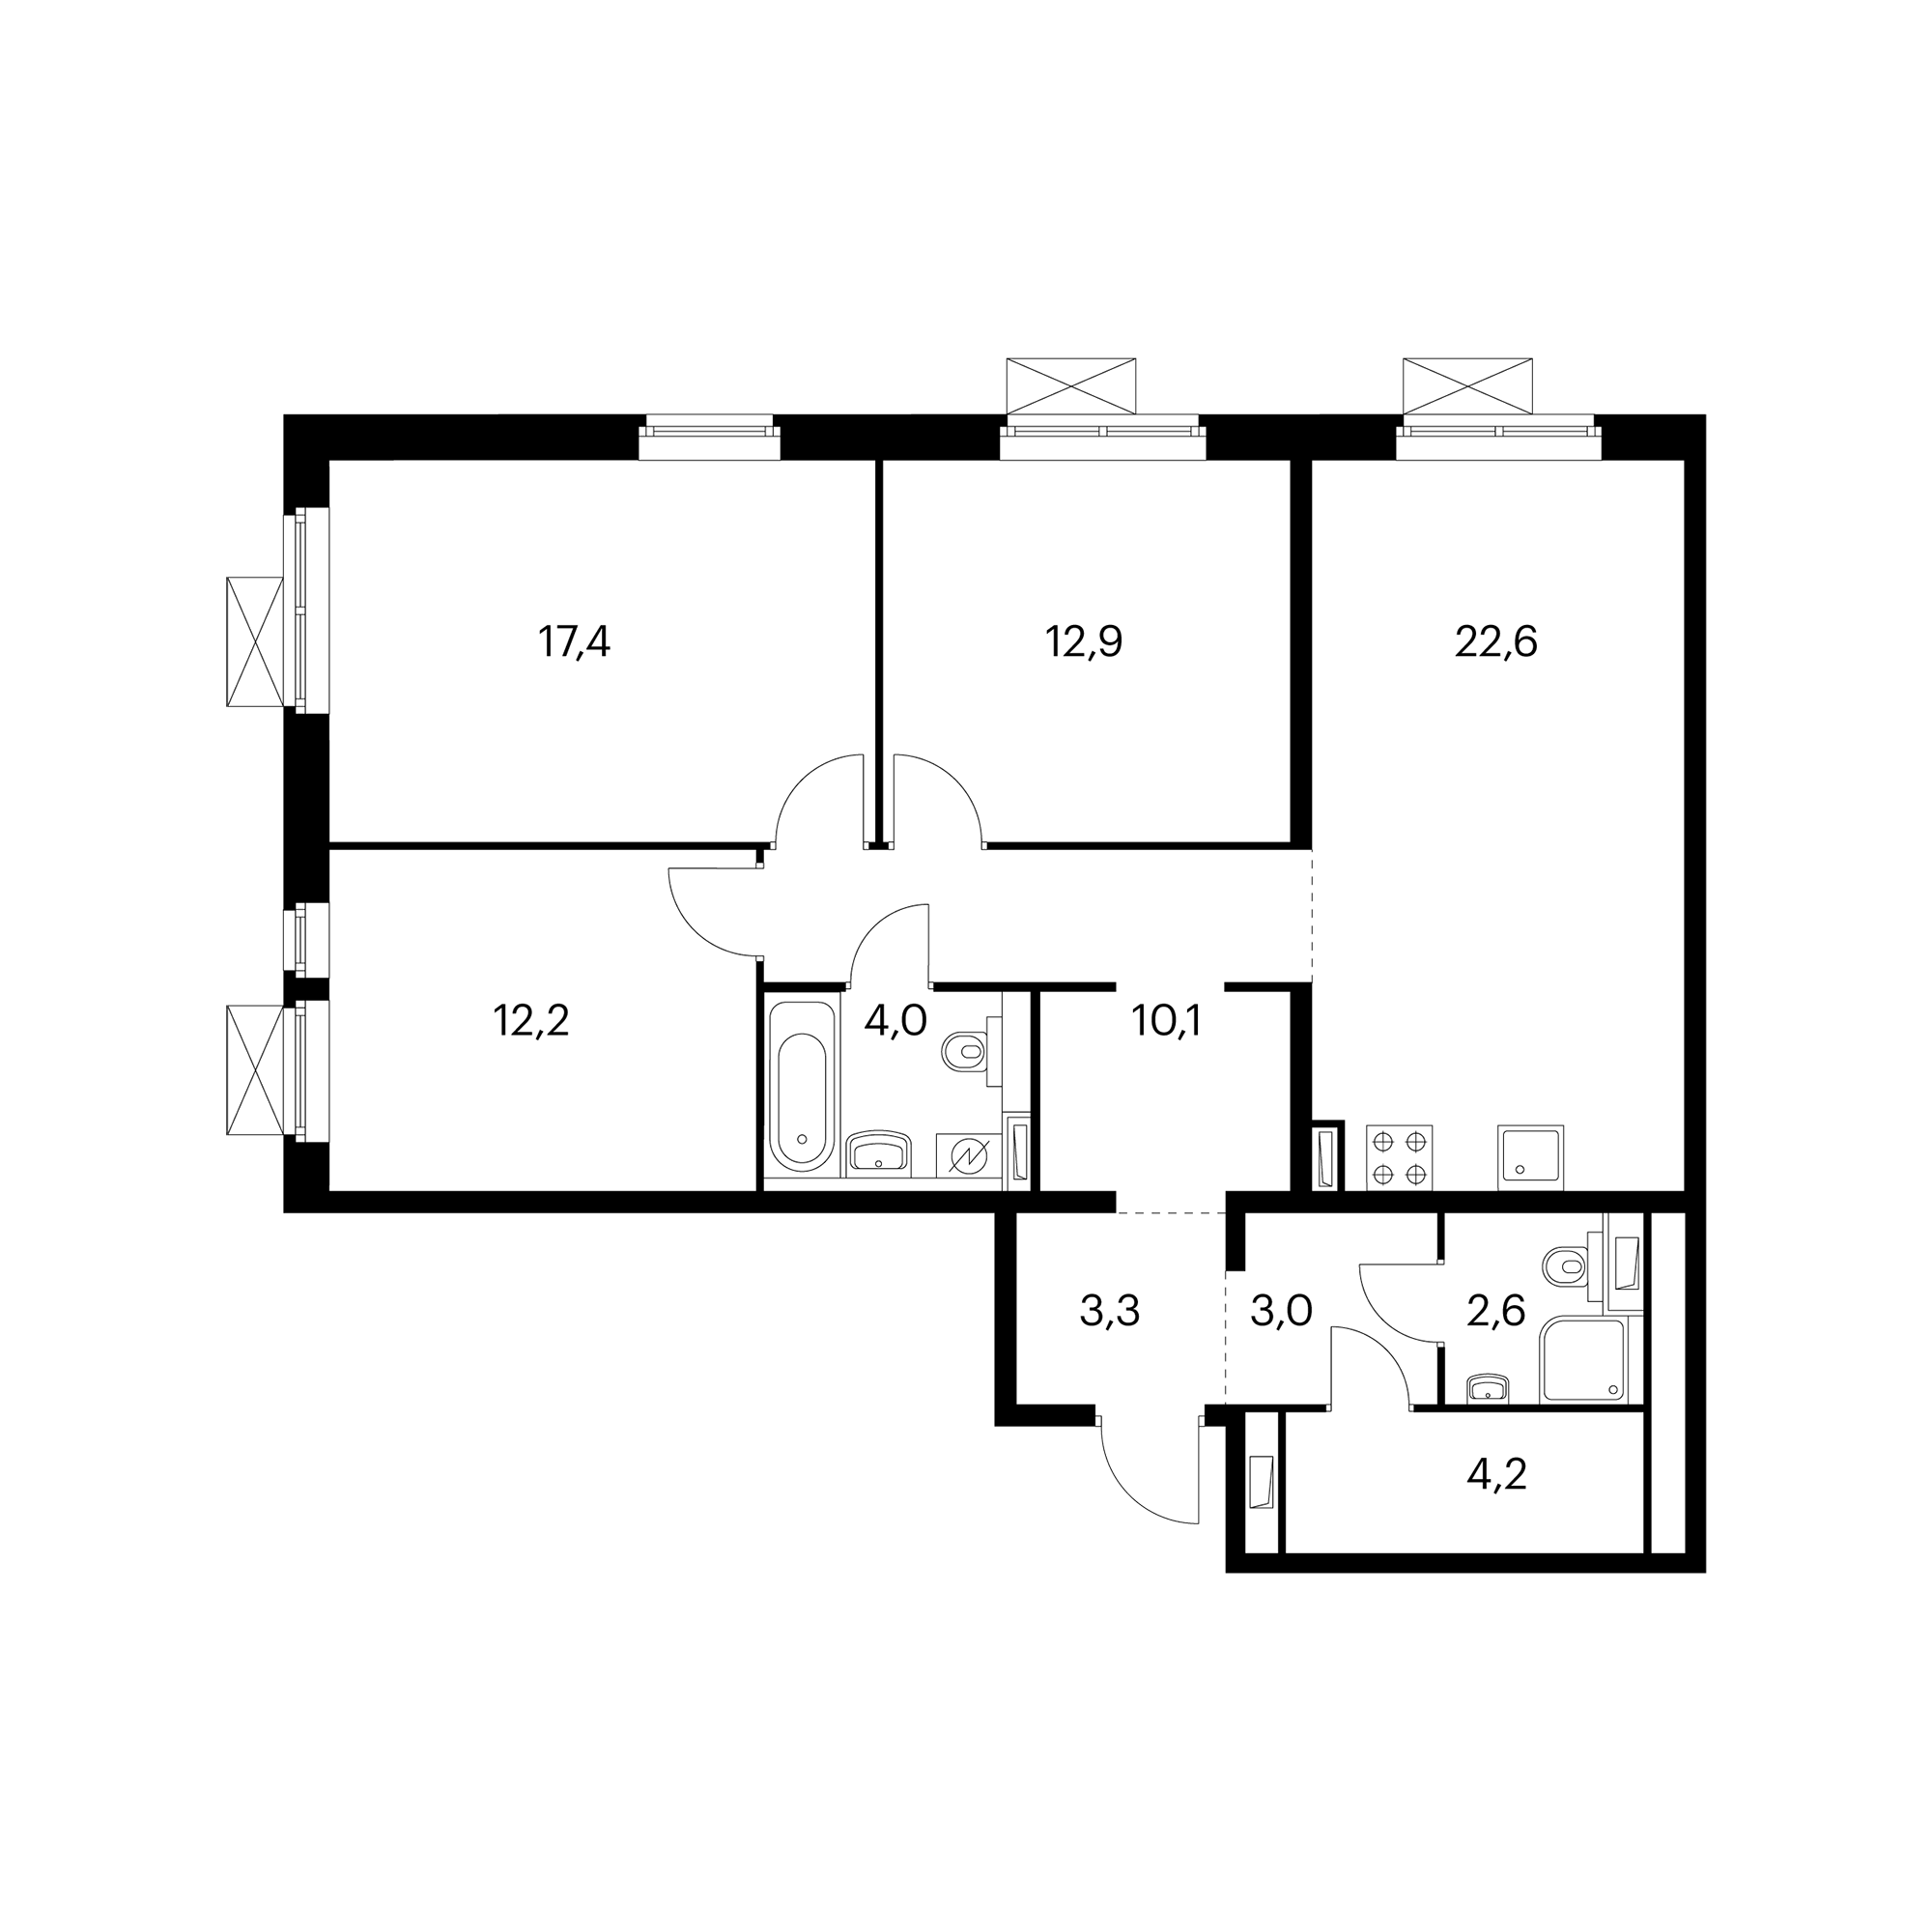 3EL23_10.2-1